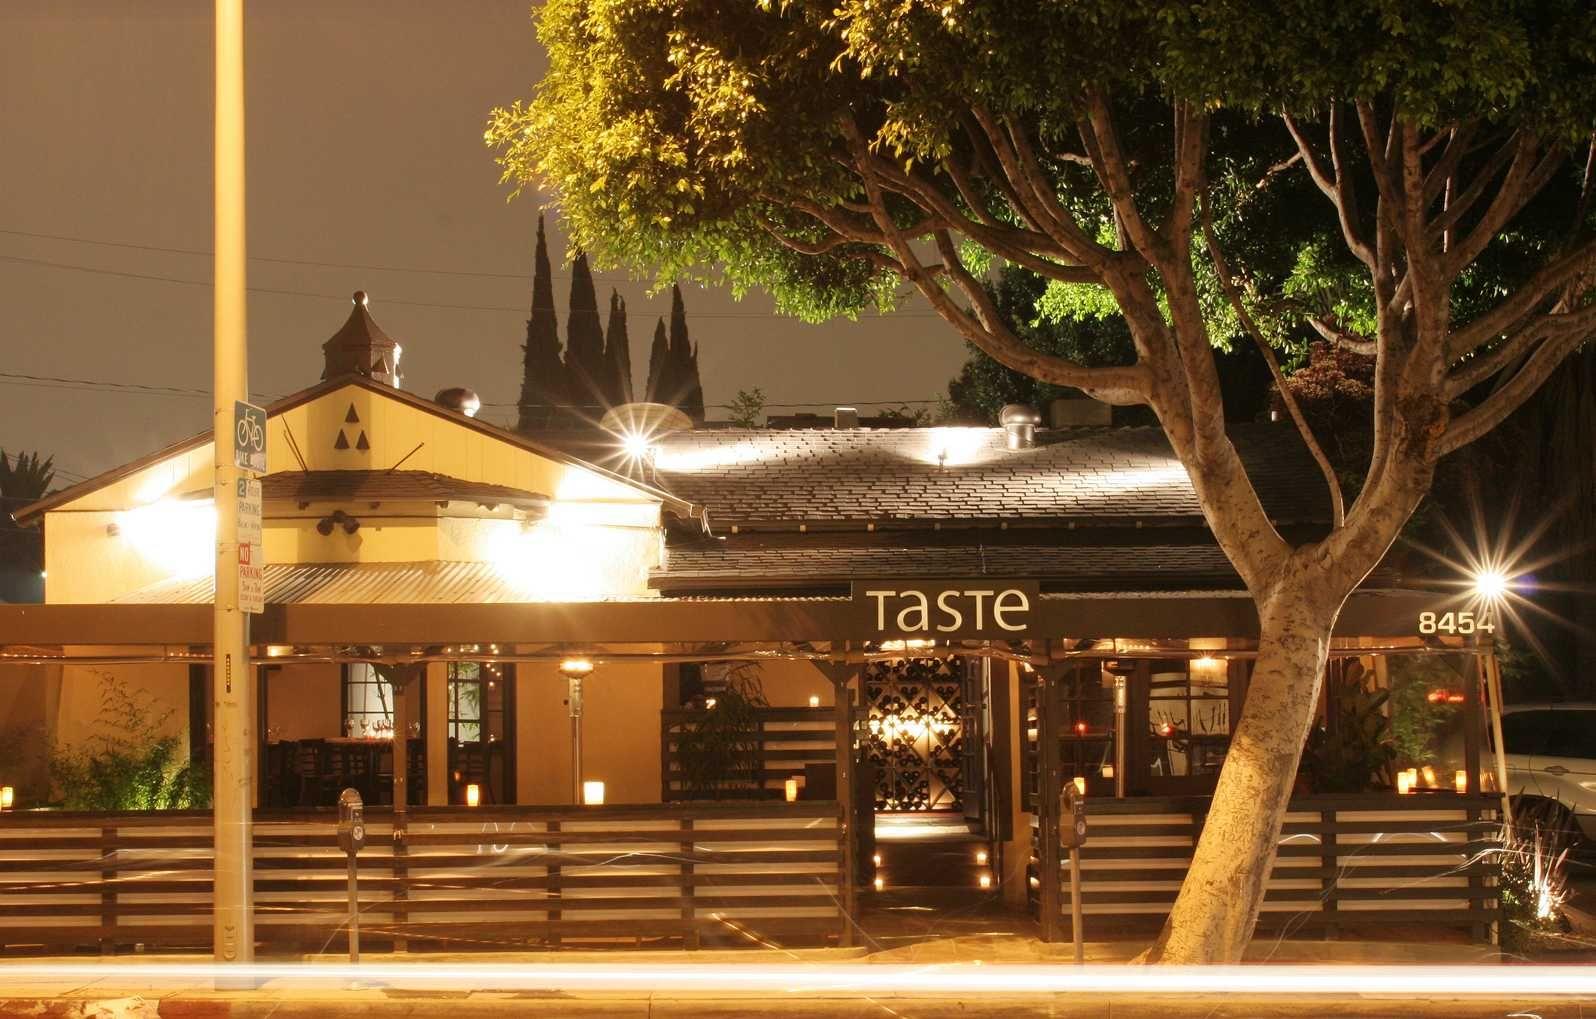 Taste On Melrose In Los Angeles Is One Of My Fav Spots In La They